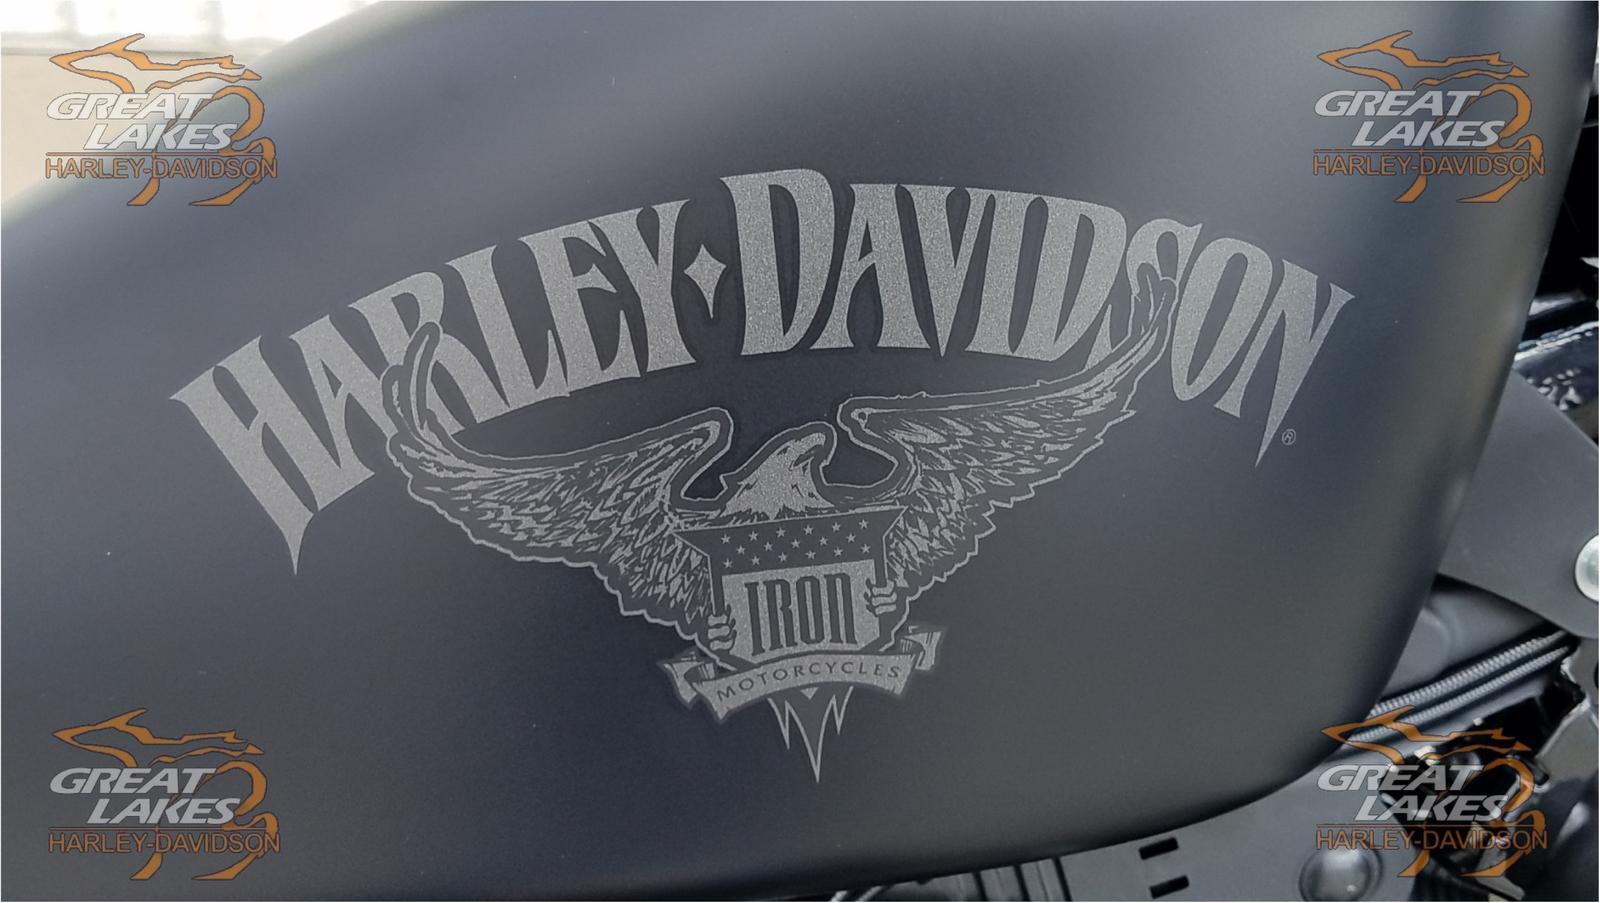 74d014dea7331 2017 harley-davidson® xl883n - 883 iron for sale in bay city